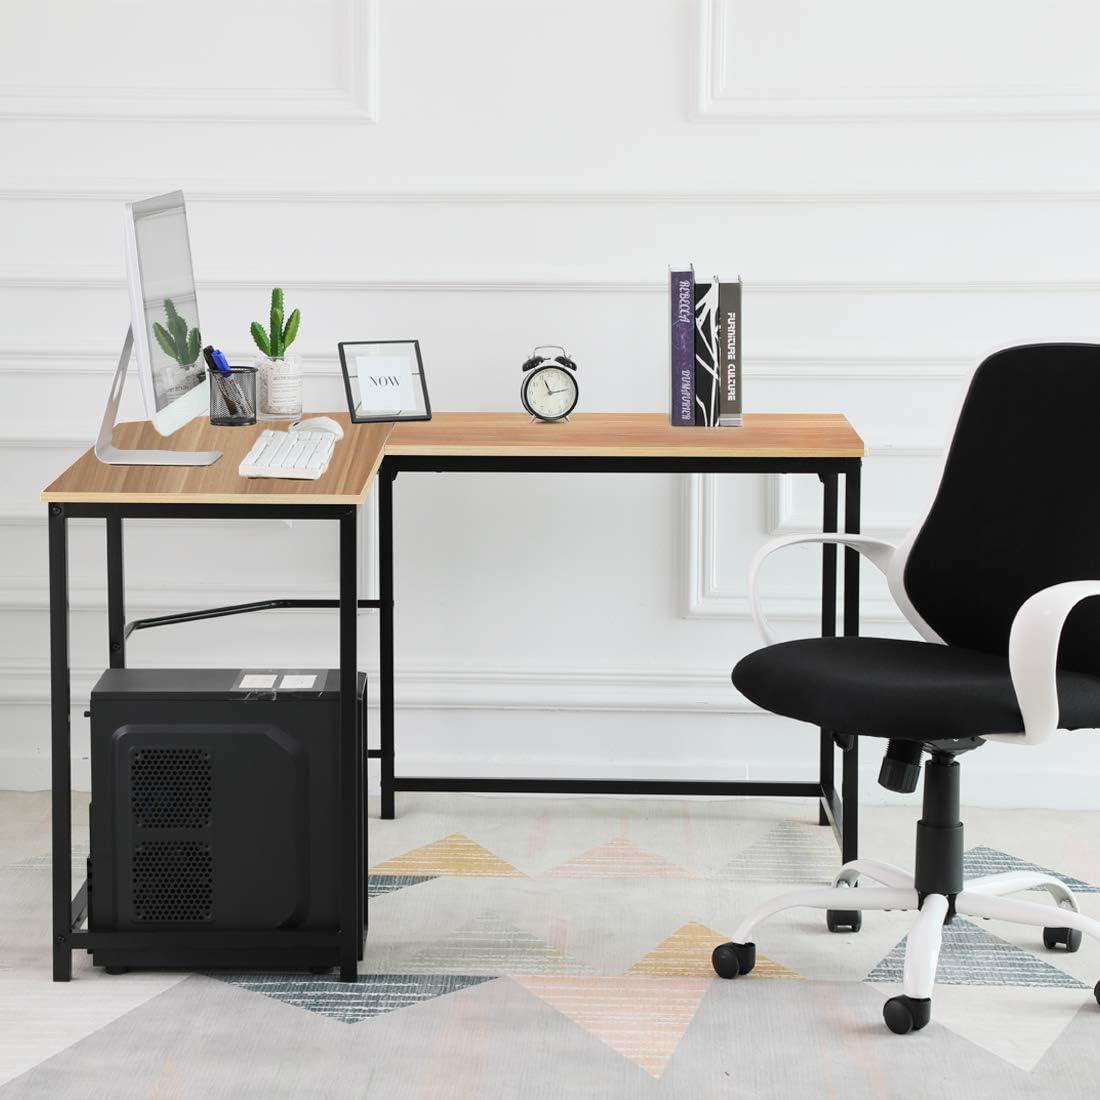 ZENSTYLE 66 x 49 L-Shaped Office Desk L Computer Corner Desks PC Latop Study Gaming Table Workstation with Wood Tabletop Metal Frame